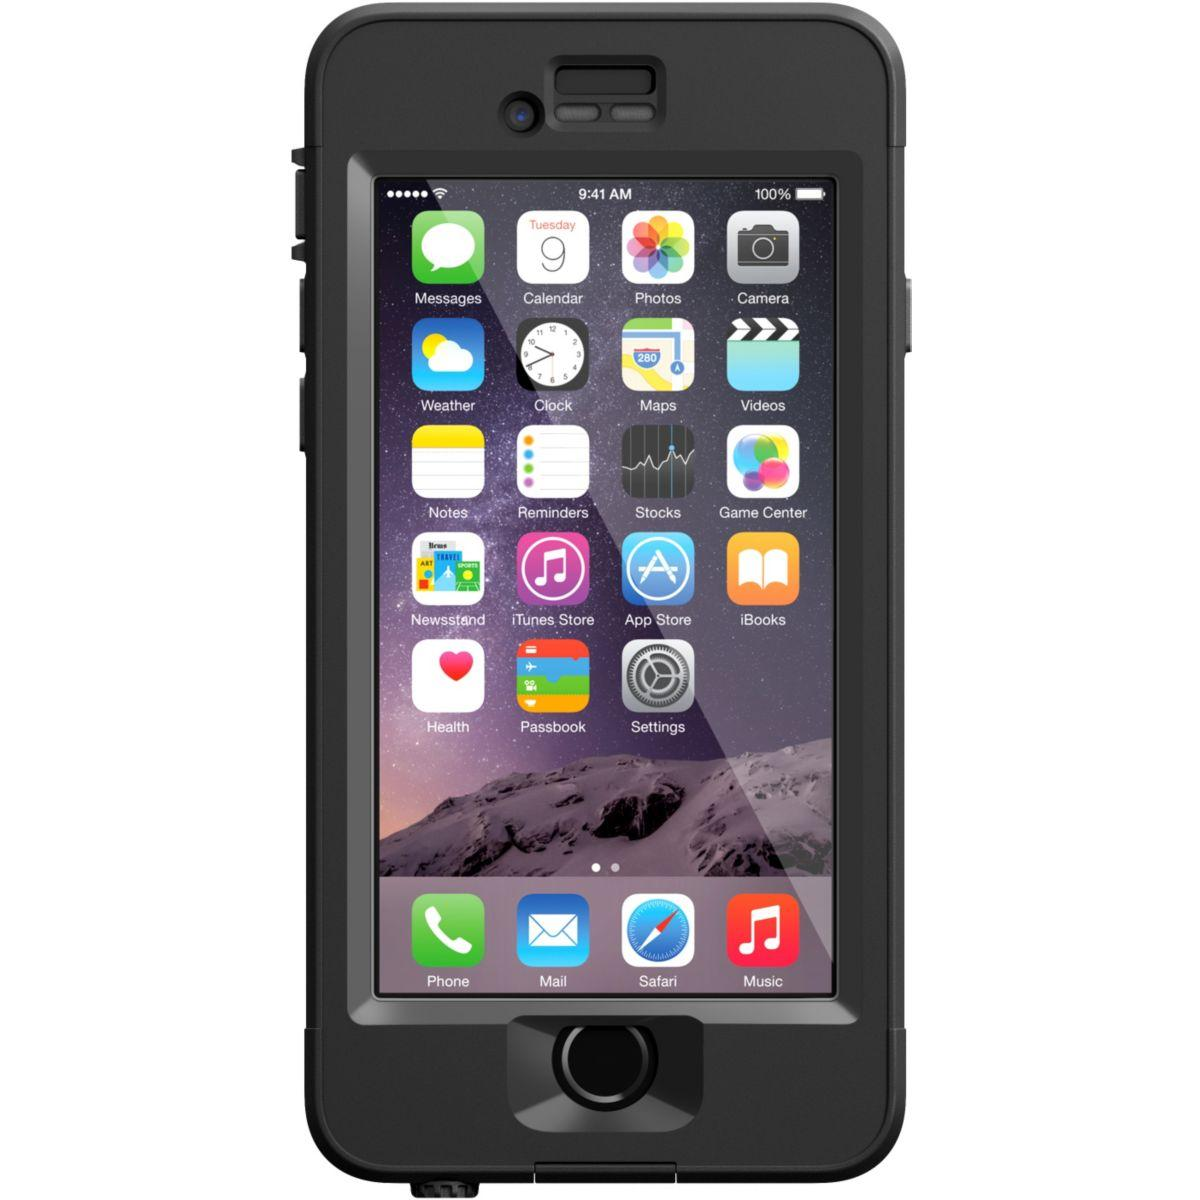 Coque lifeproof nuud iphone 6 noir v2